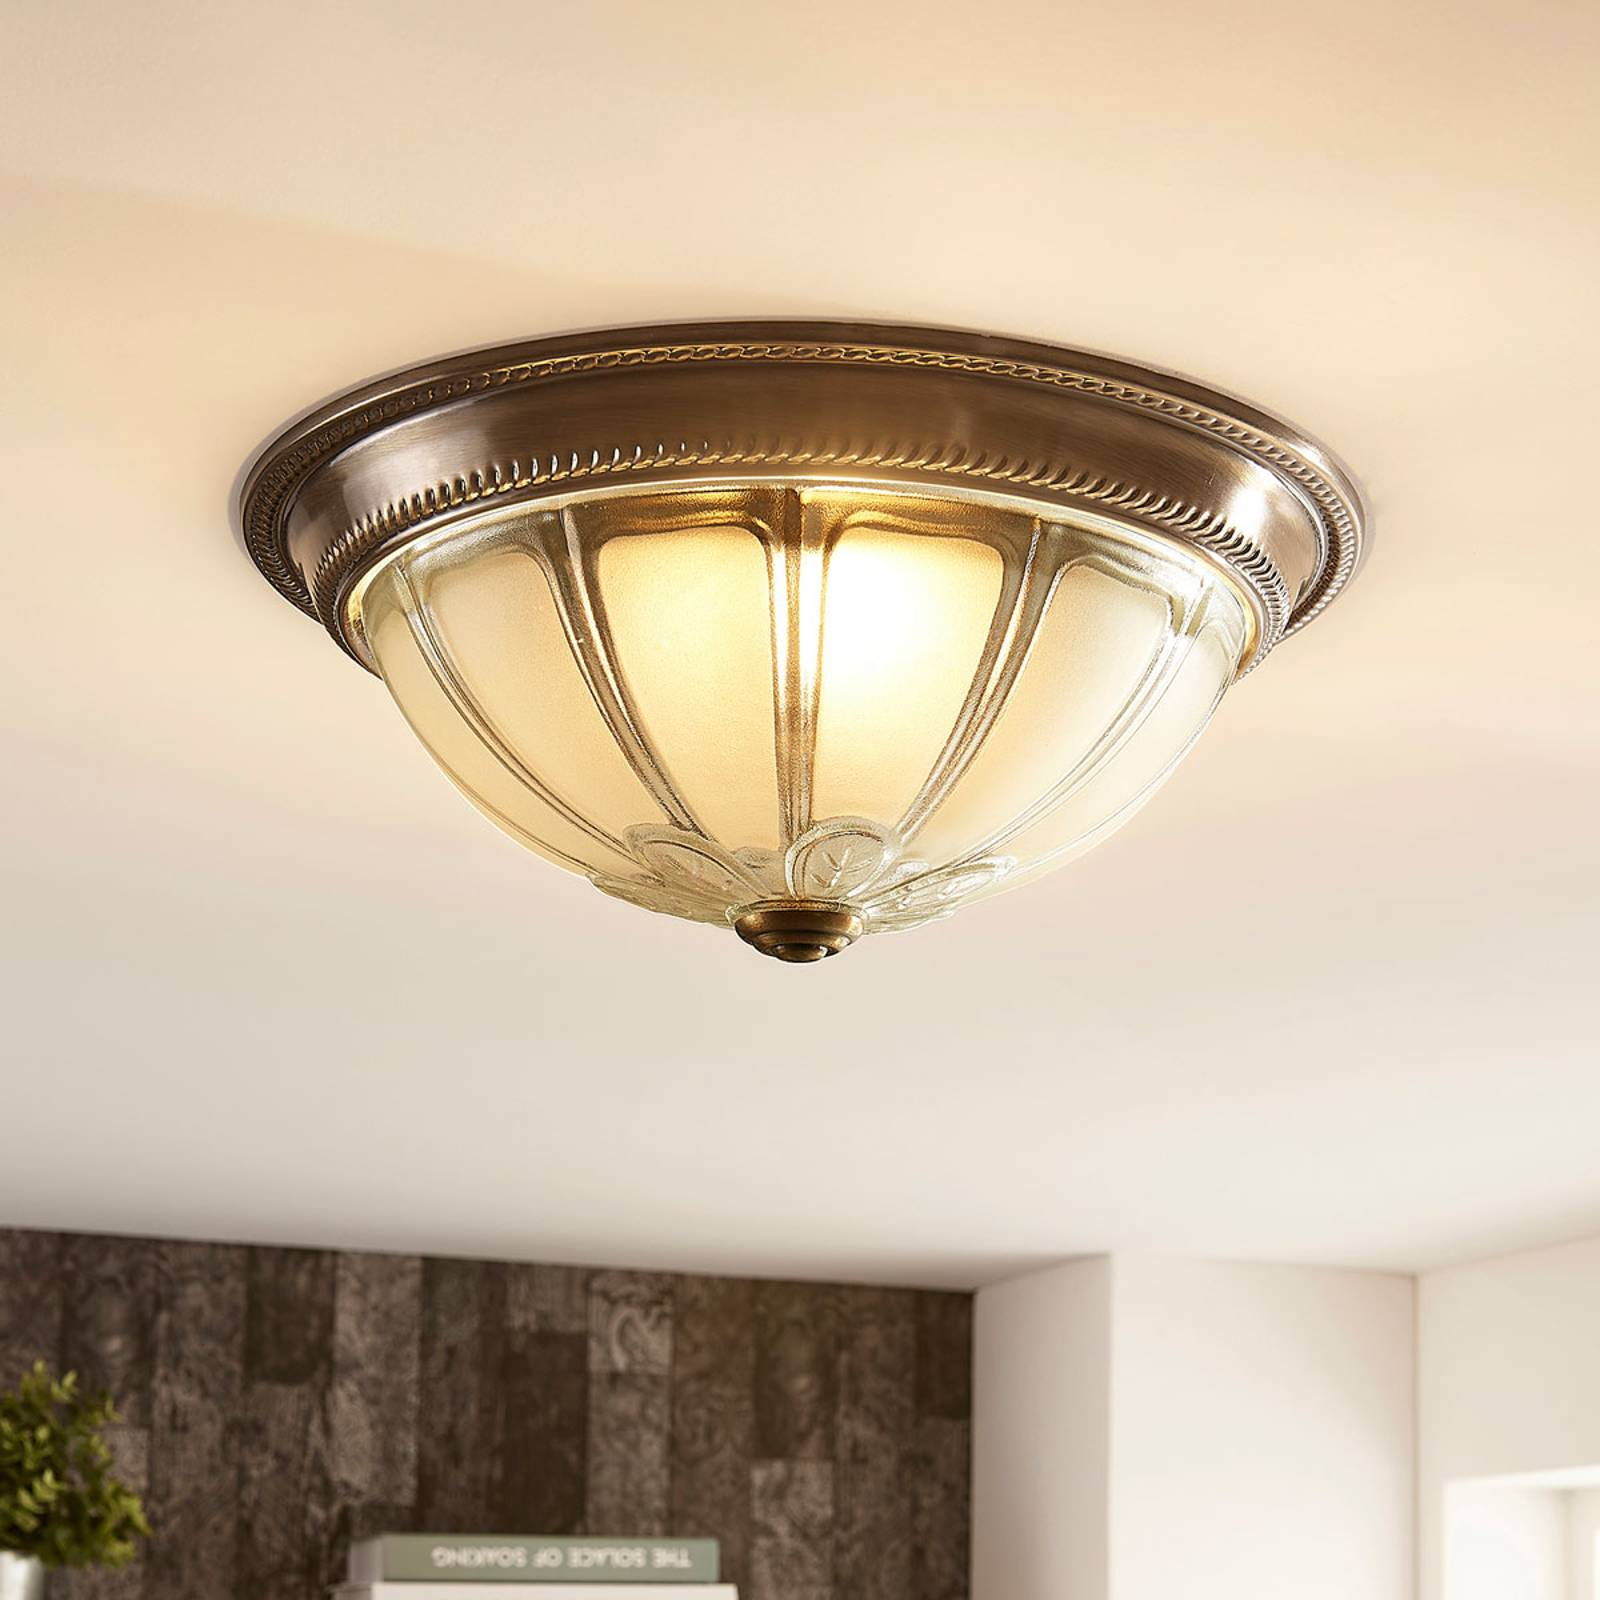 Lampa sufitowa LED Henja, ściemniana 3-stopniowo